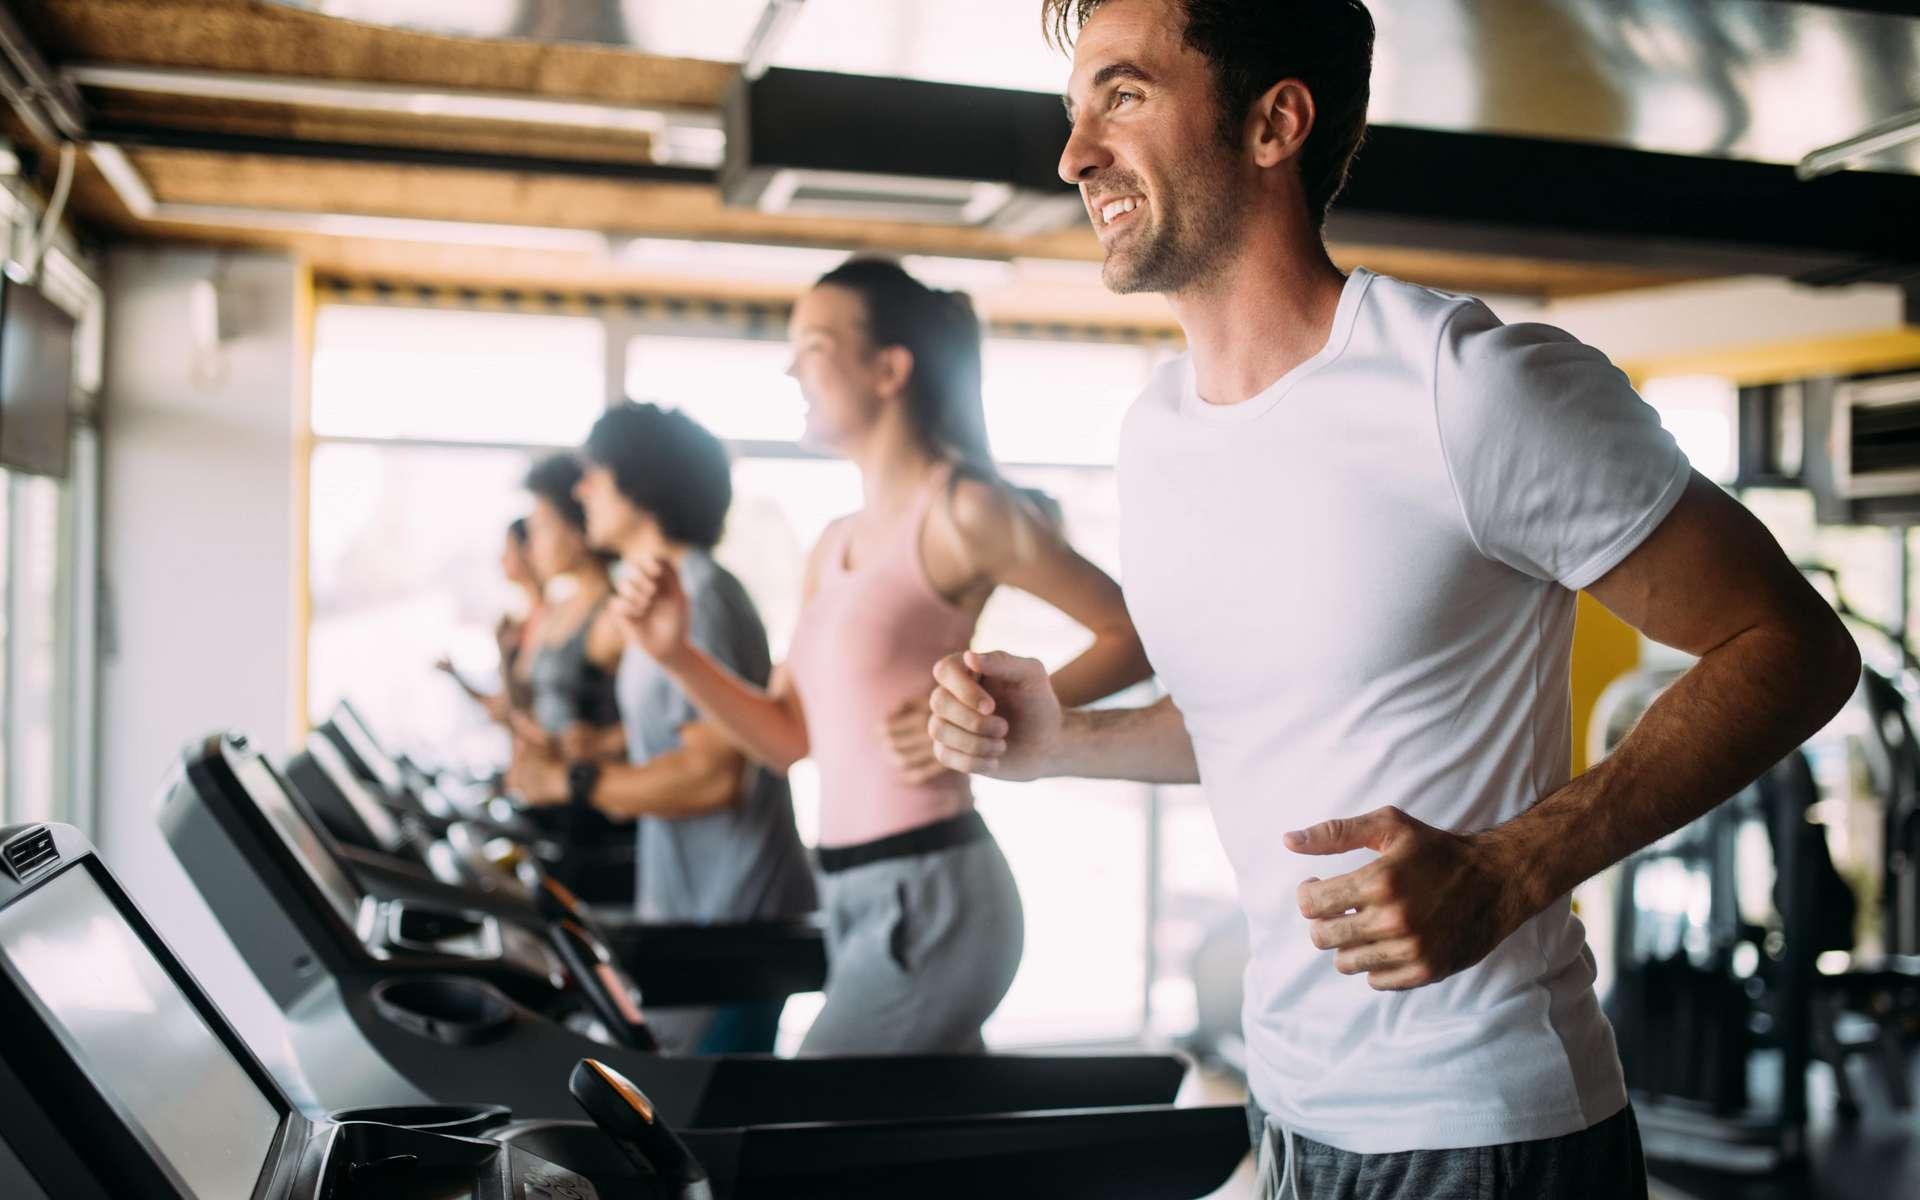 French Days : les meilleures offres sport et fitness sur Cdiscount © NDABCREATIVITY, Adobe Stock